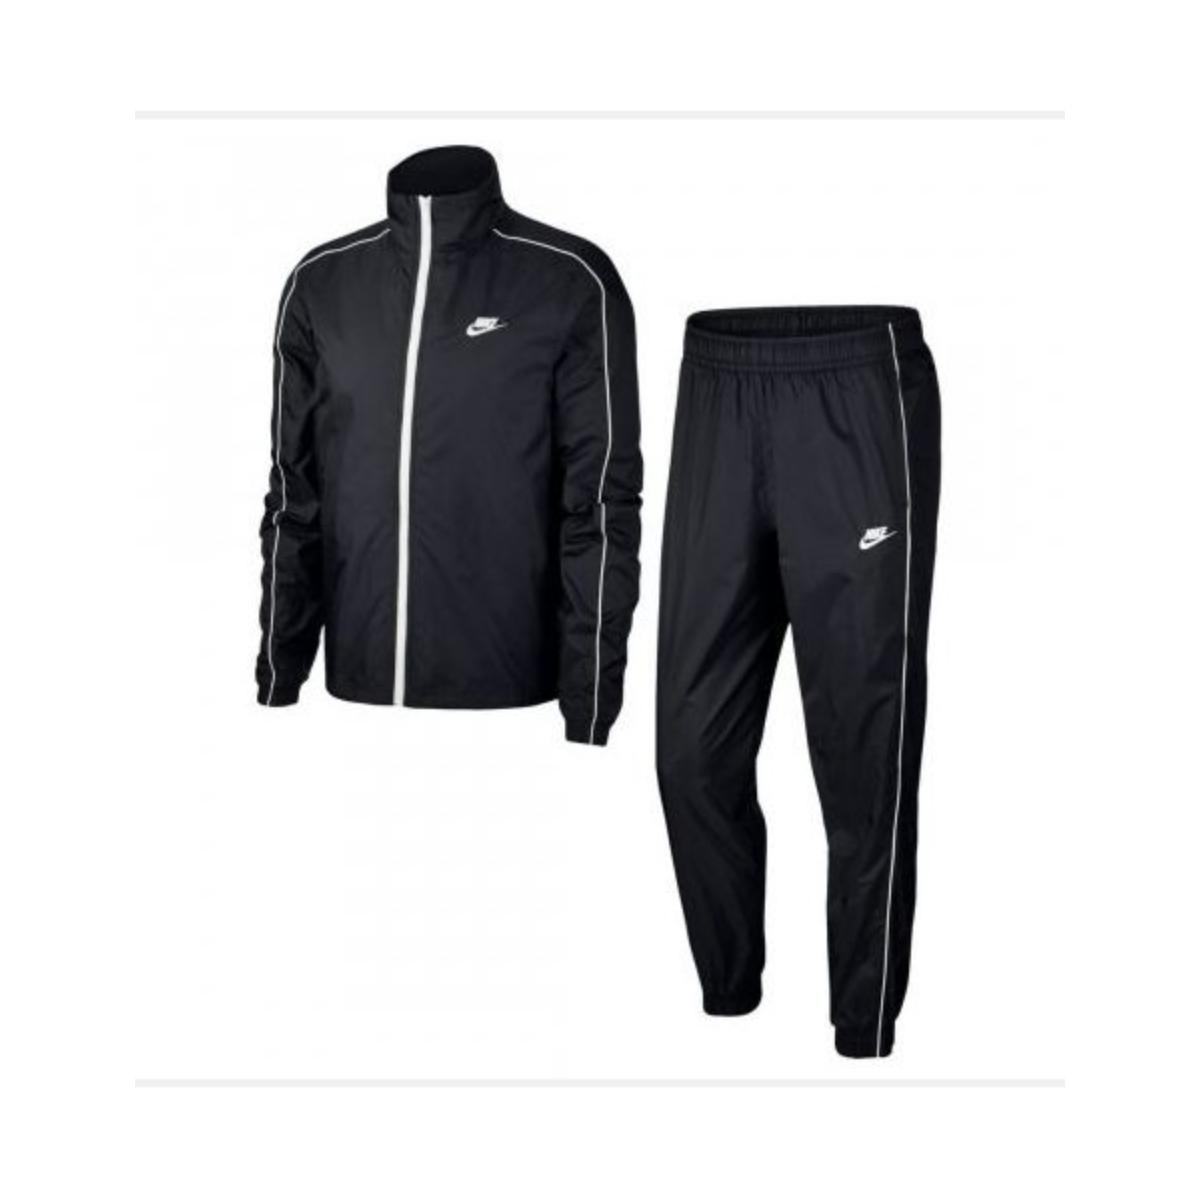 Abrigo Masculino Nike Bv3030-010 Sportwear Preto